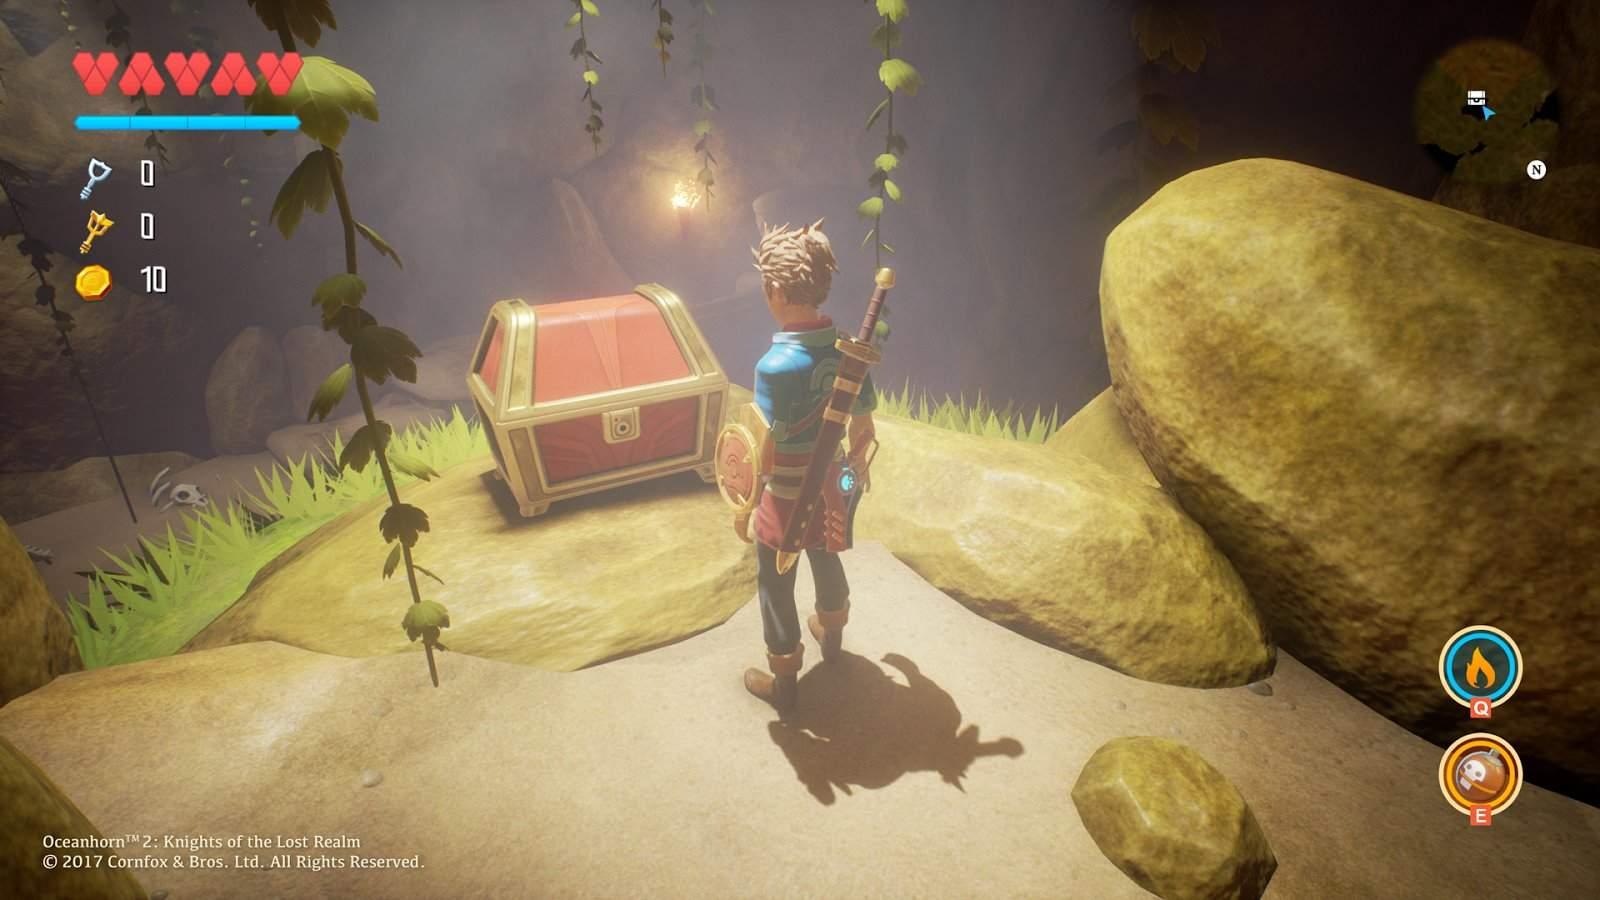 Oceanhorn-2-PC-screenshot-Wayward-Caves Oceanhorn 2: novas imagens mostram jogo com Unreal Engine 4